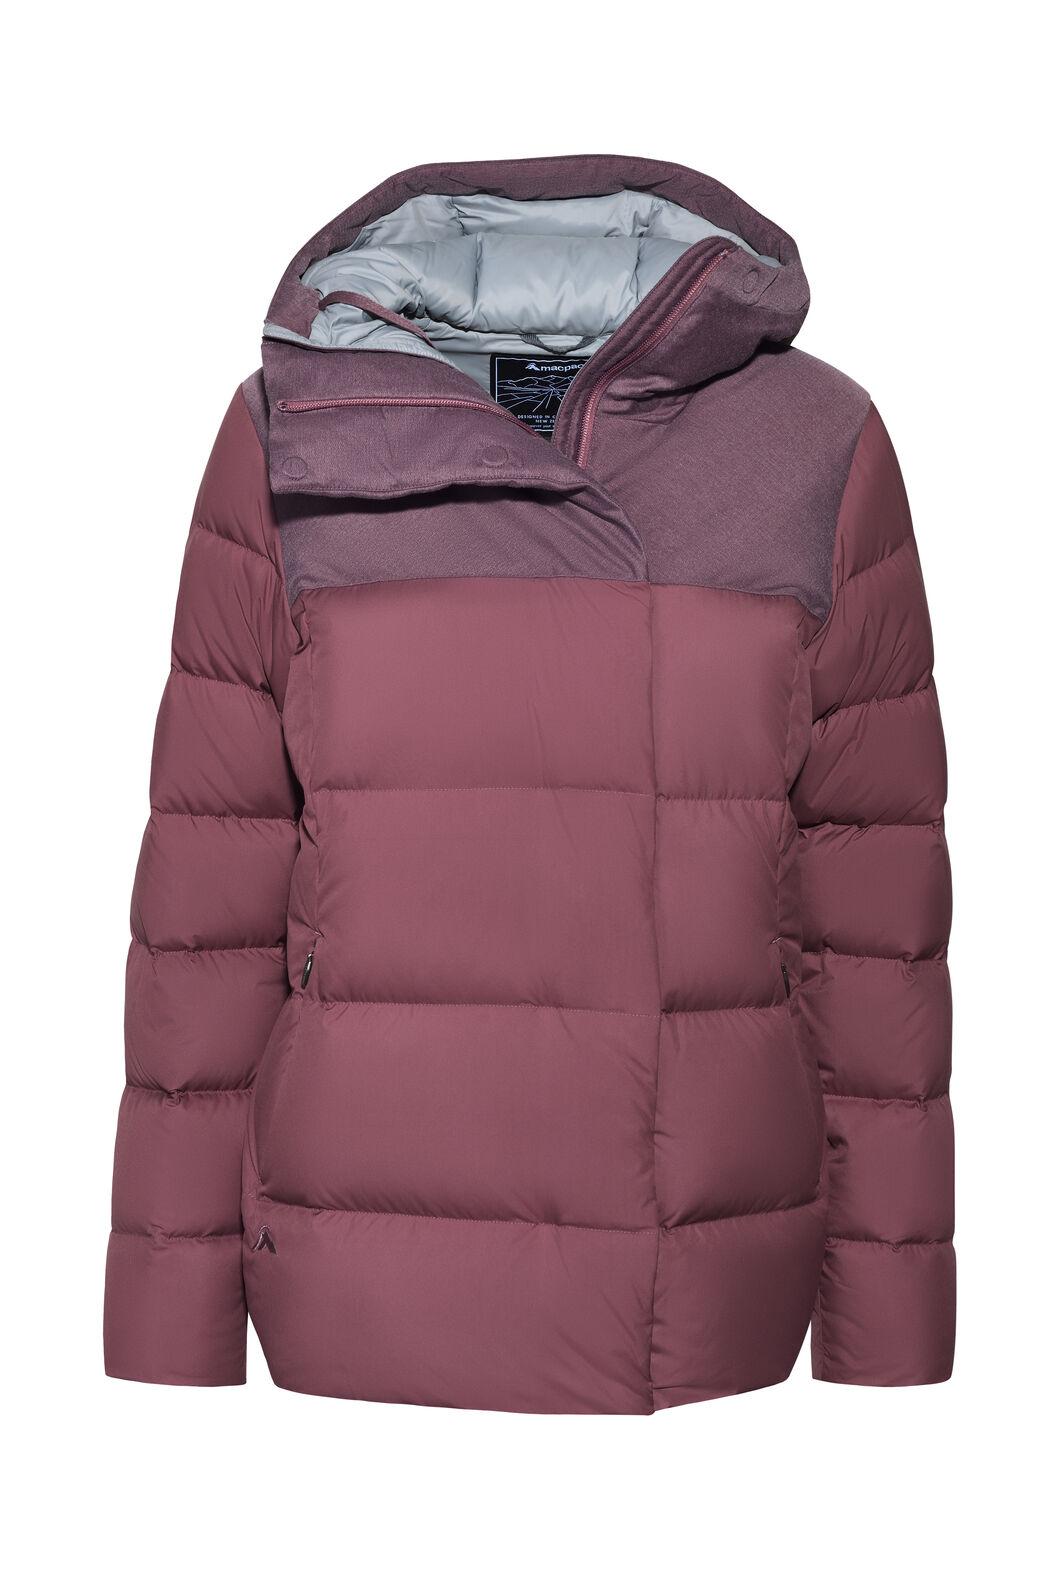 Macpac Novo Hooded Down Jacket — Women's, Rose Brown, hi-res